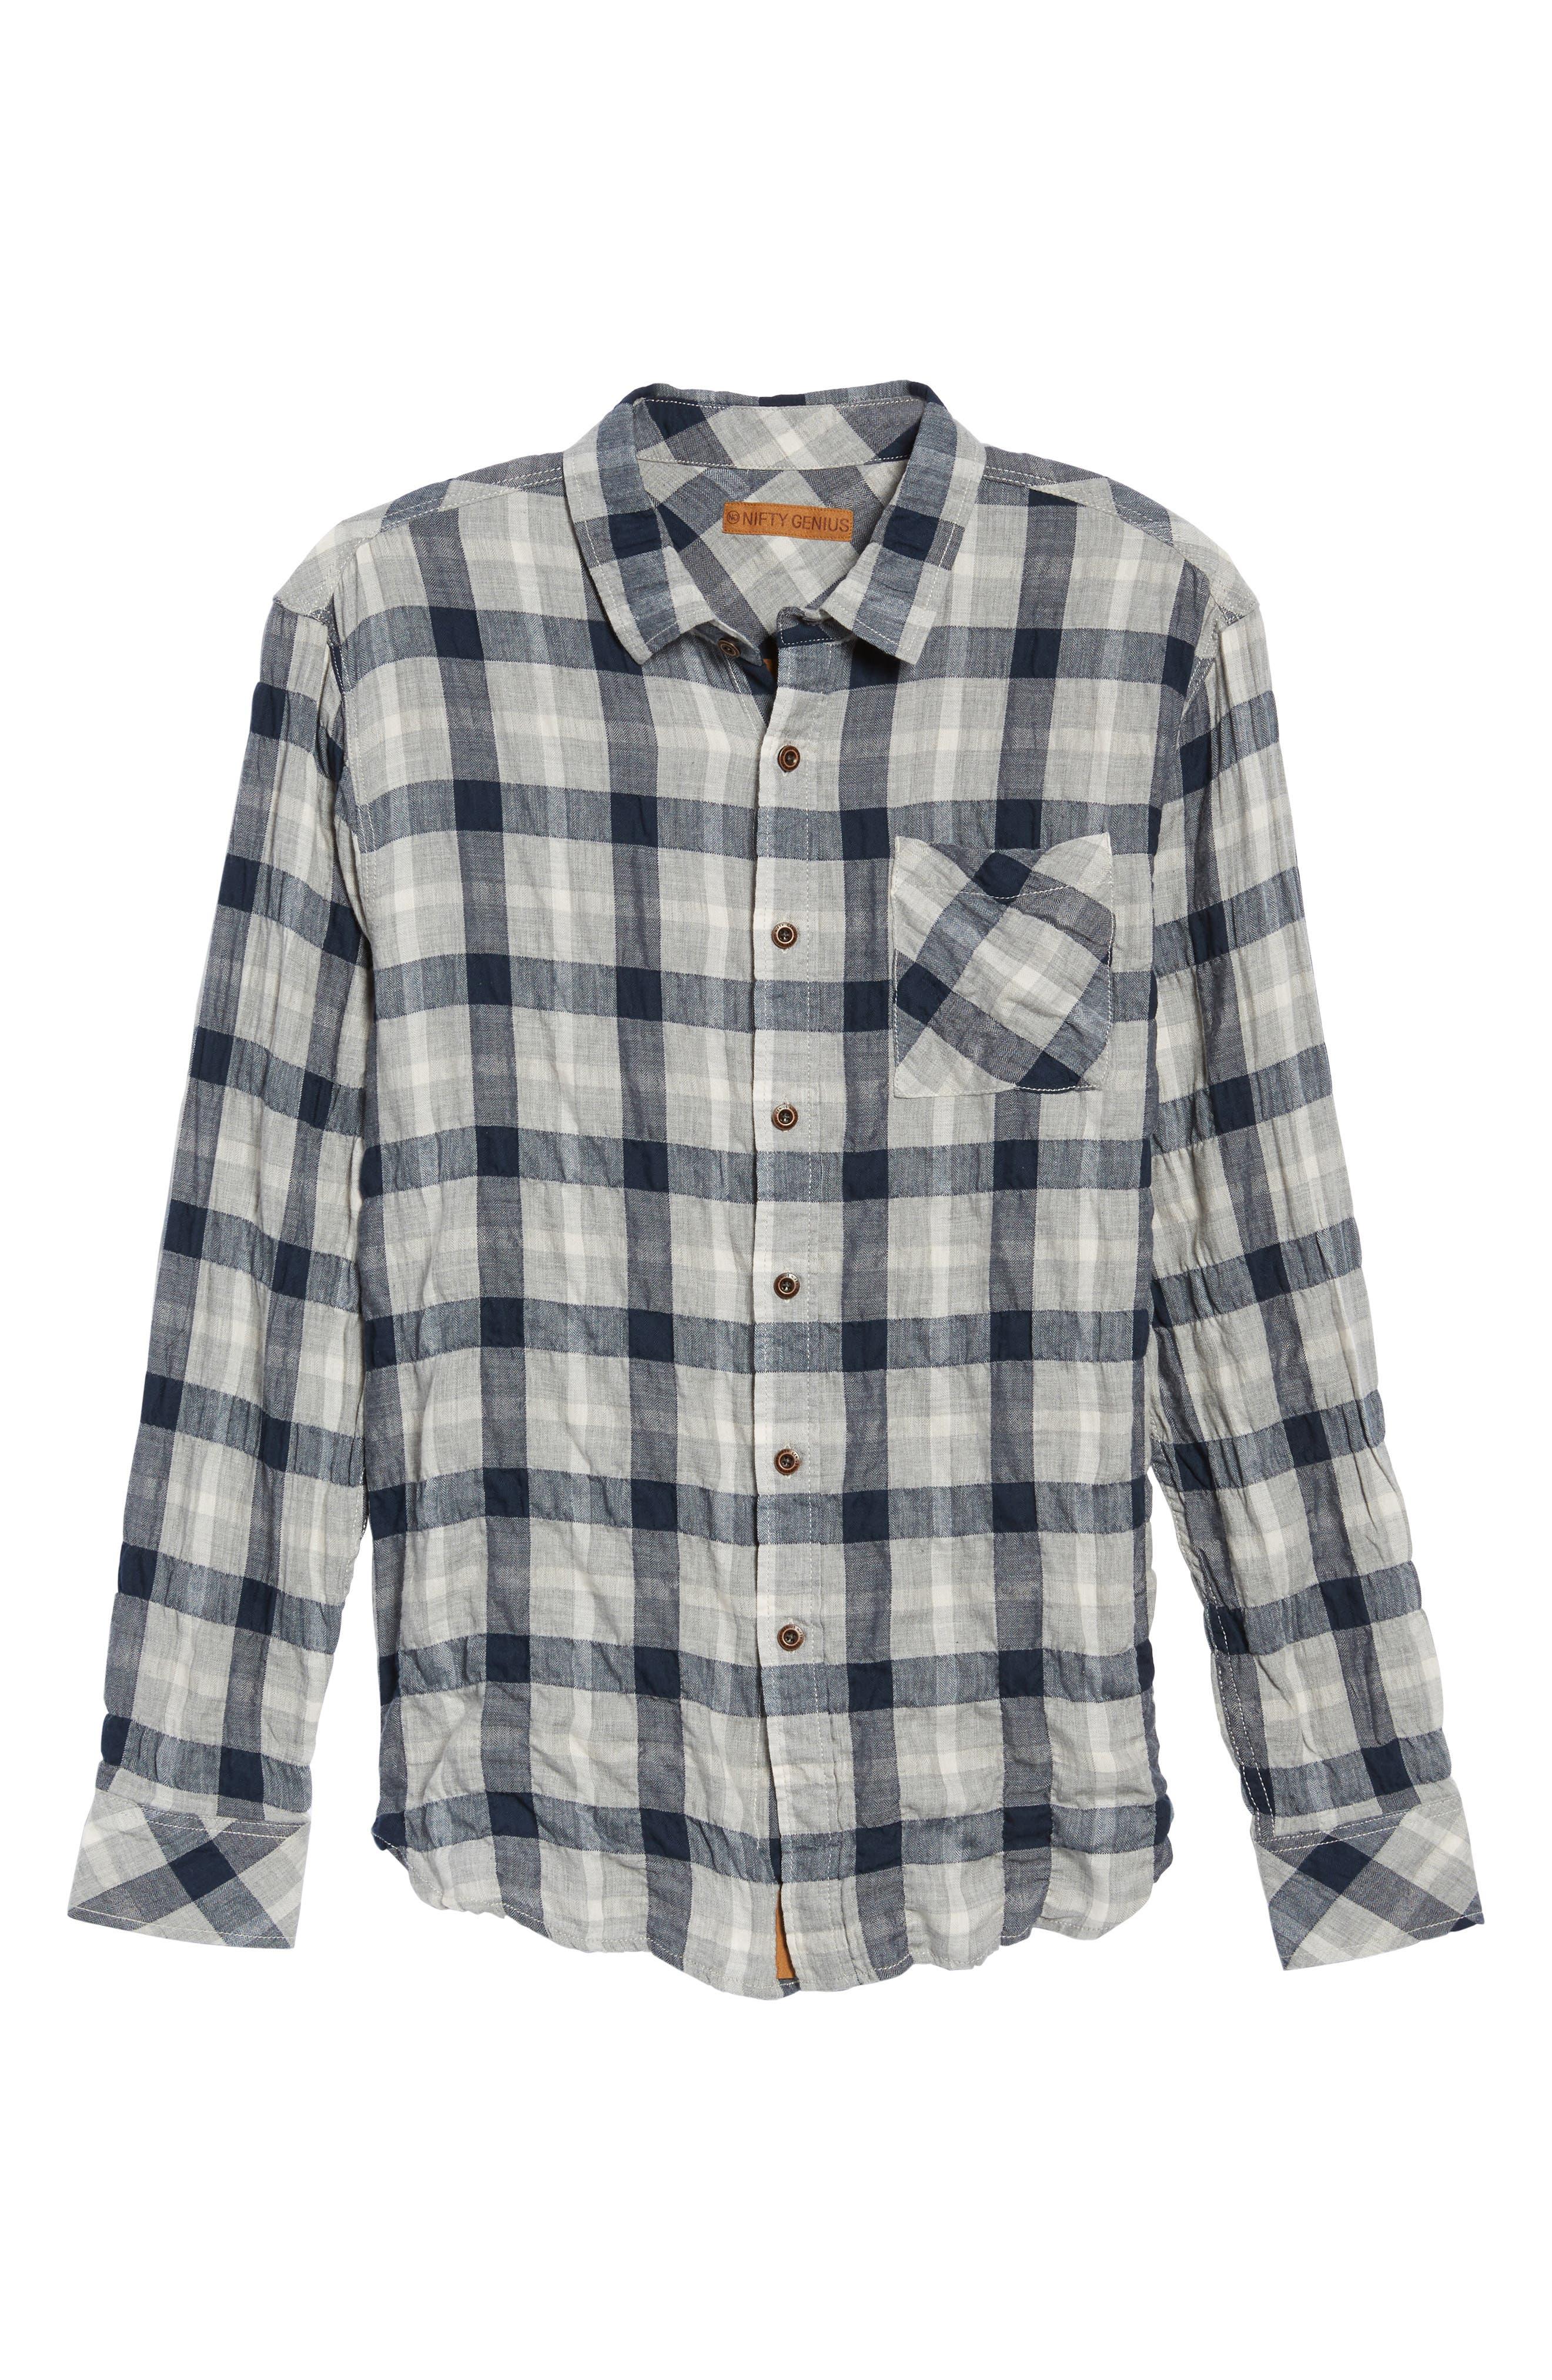 Truman Plaid Sport Shirt,                             Alternate thumbnail 6, color,                             Gray/ Navy/ White